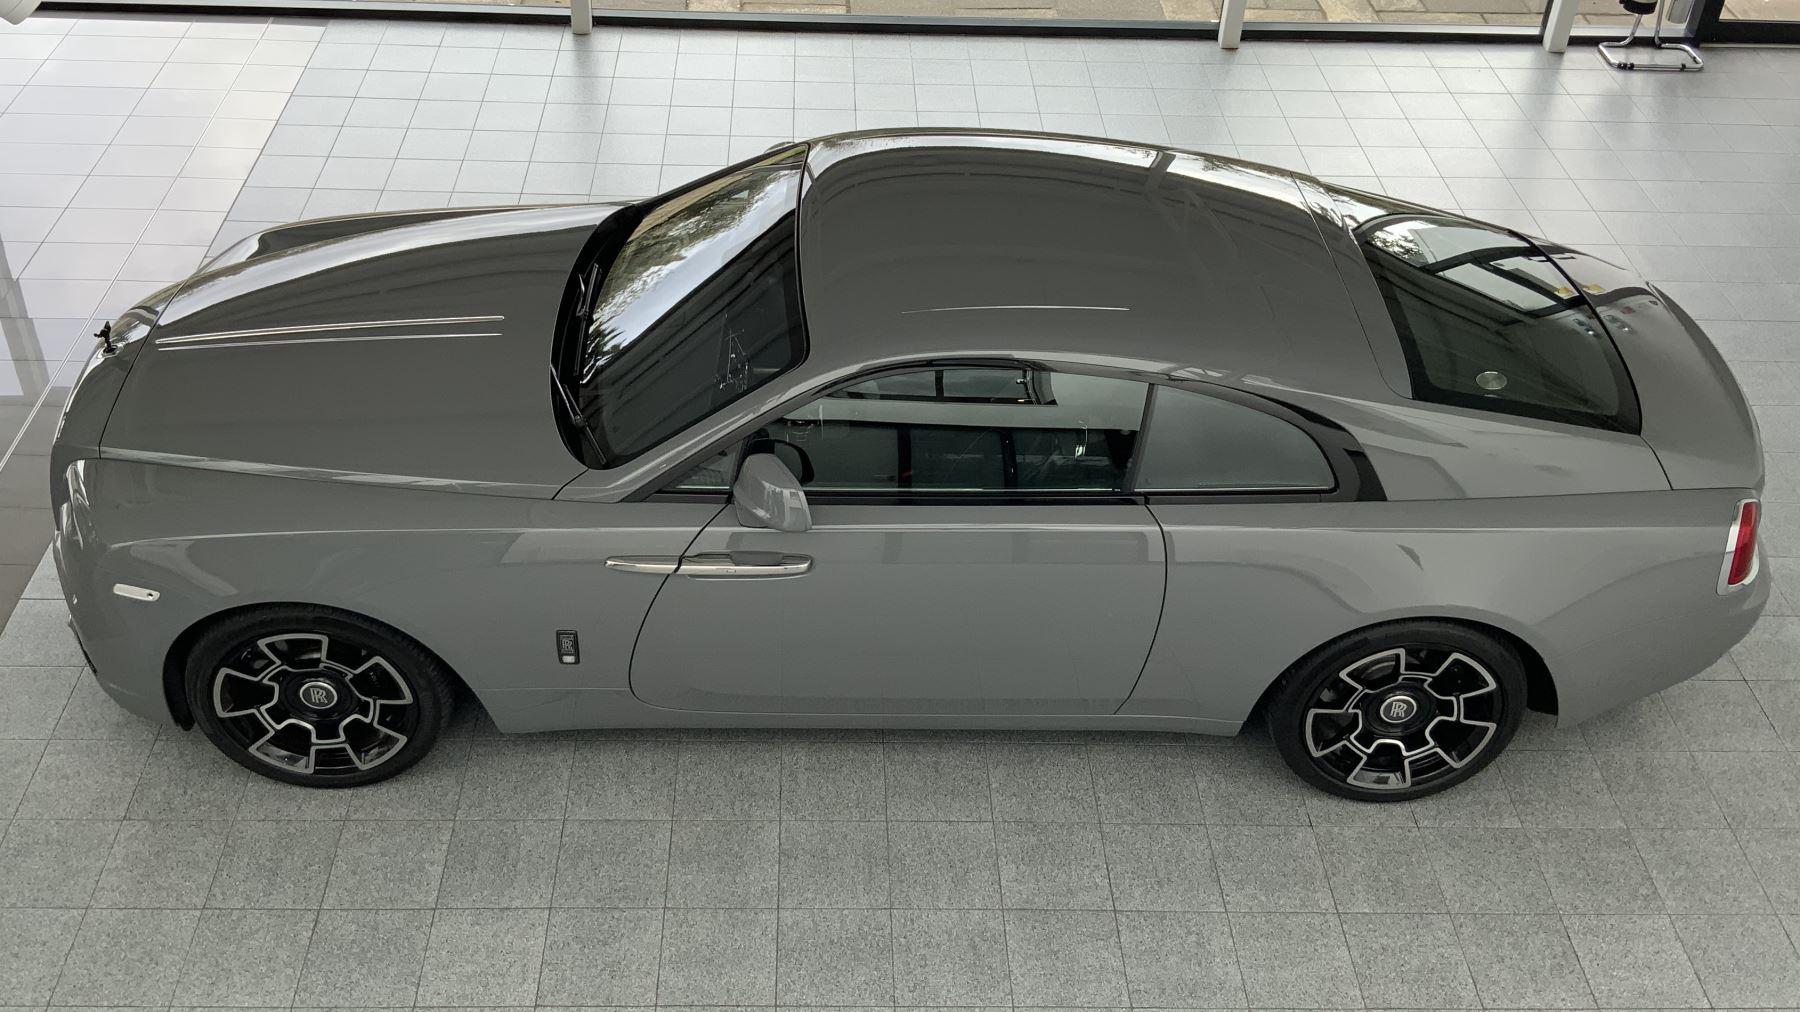 Rolls-Royce Black Badge Wraith V12 image 7